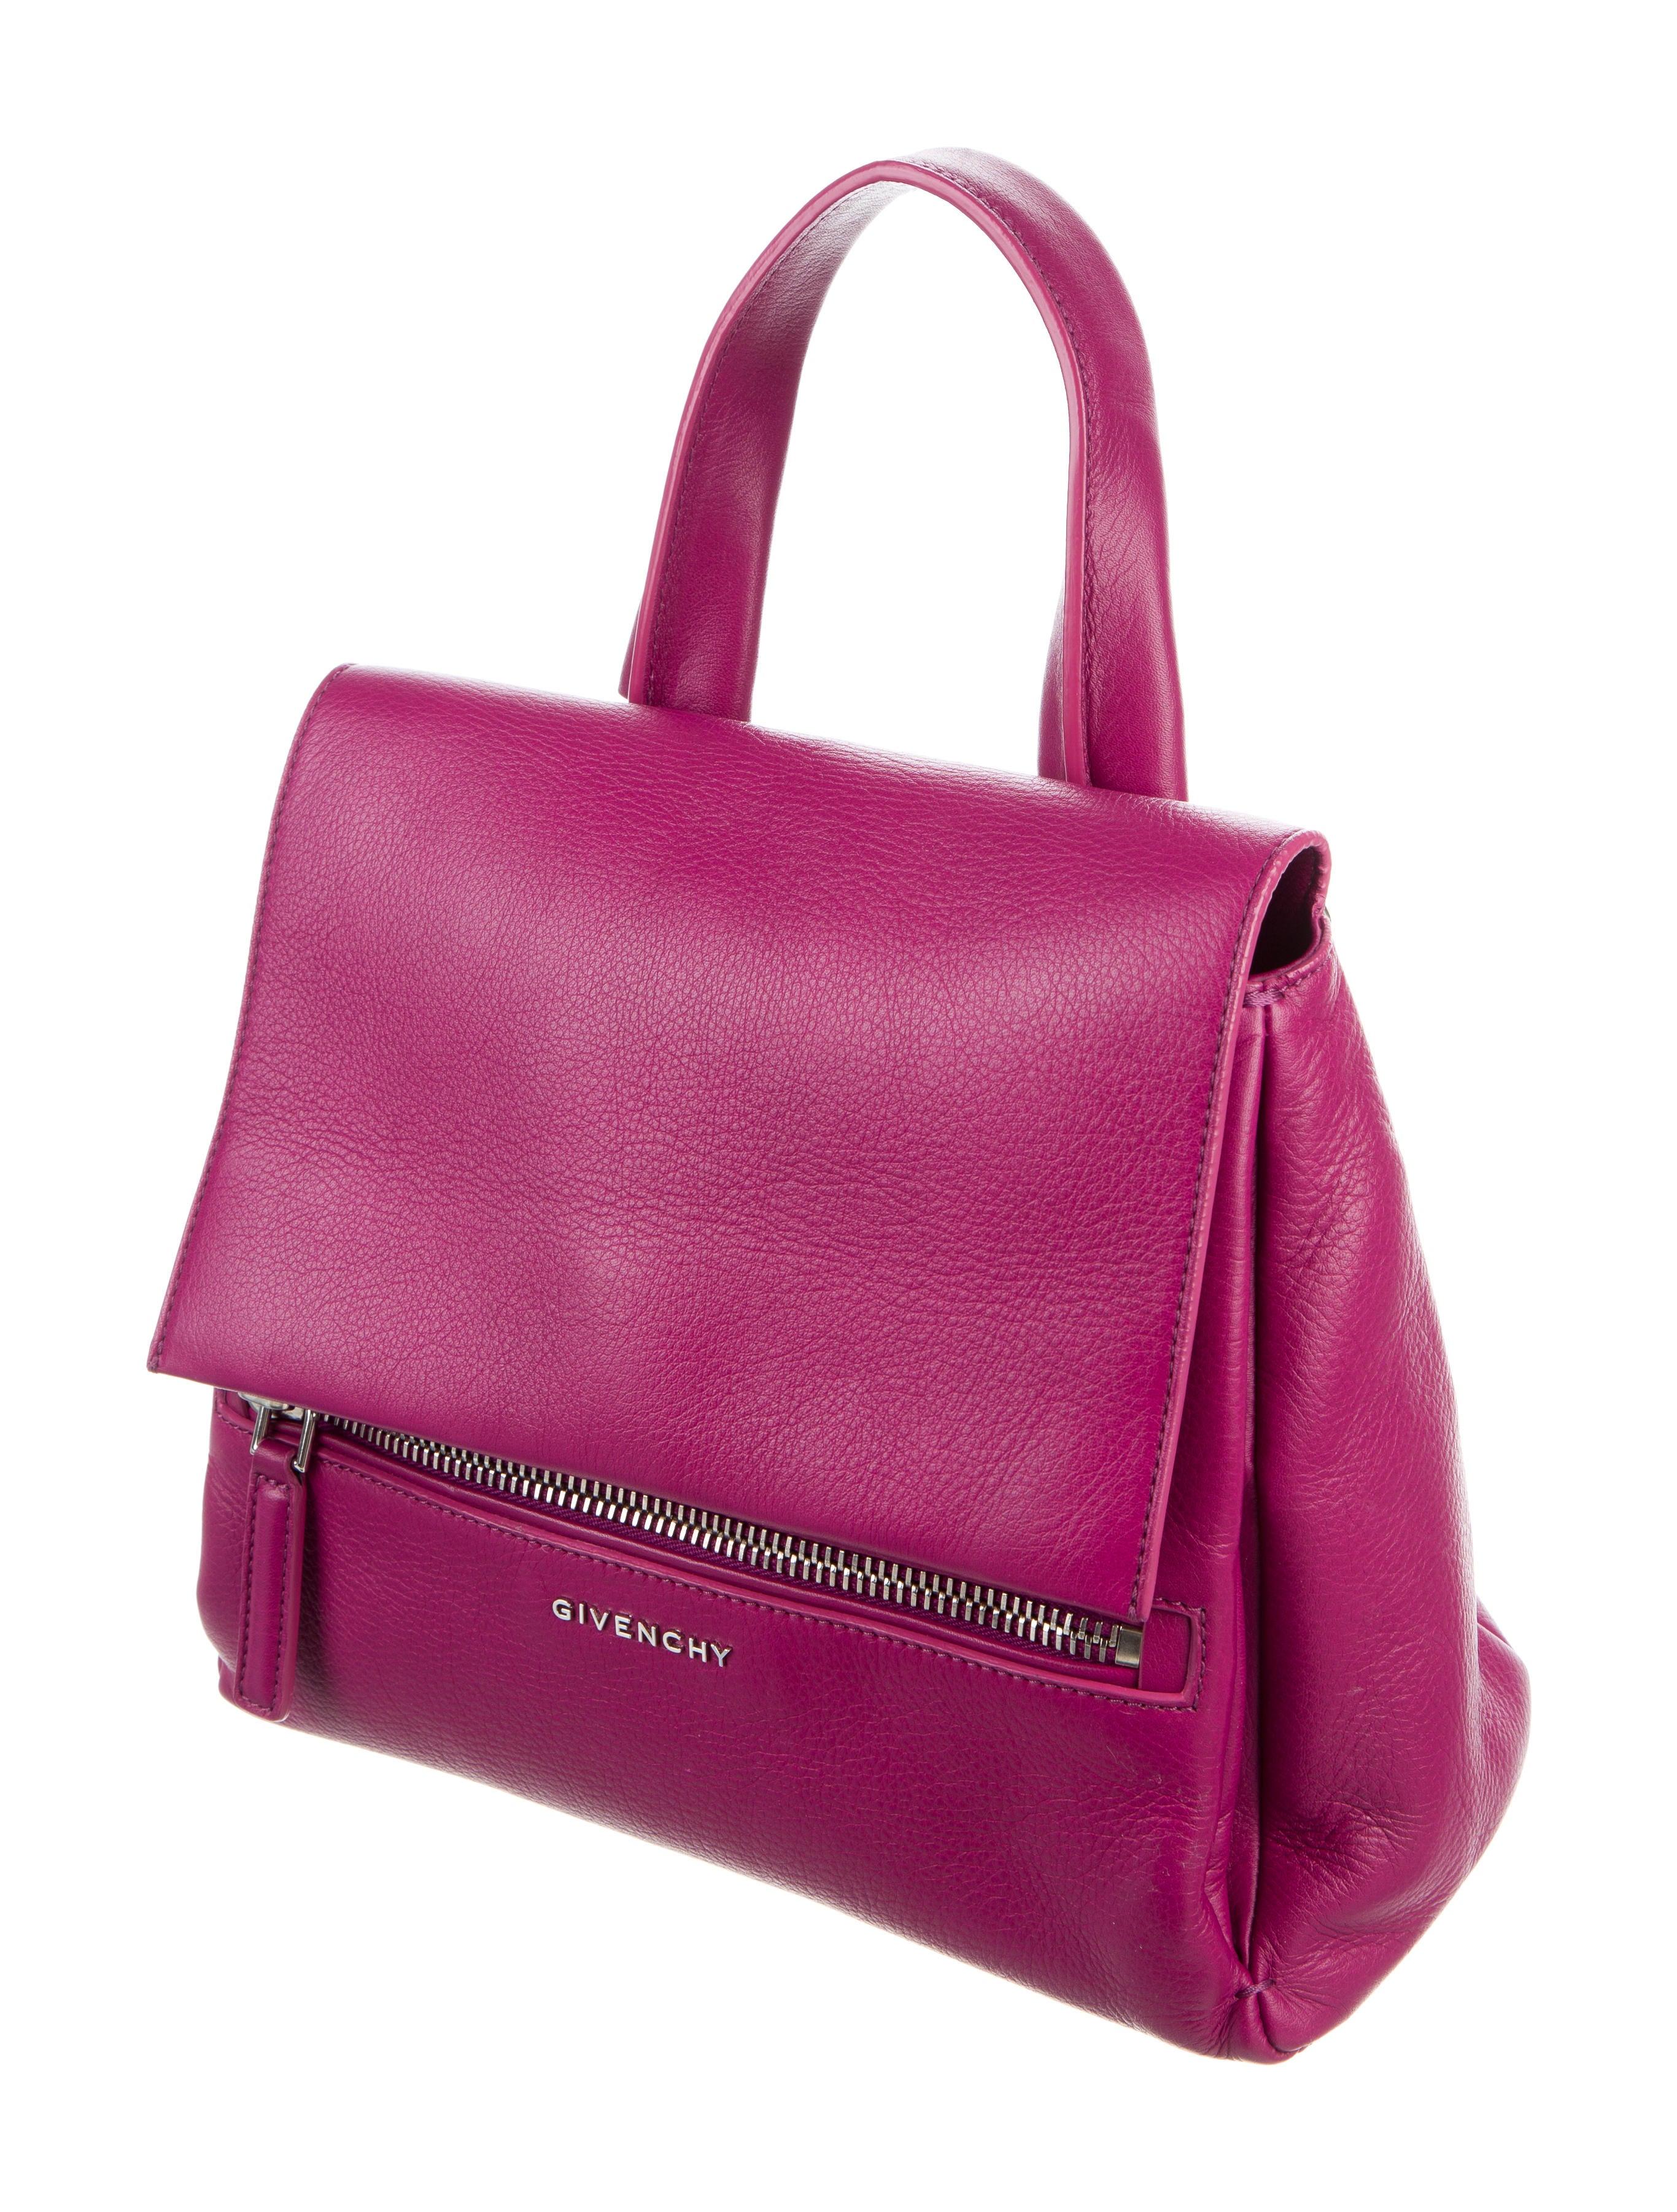 Givenchy Small Pandora Pure Bag Handbags Giv40386